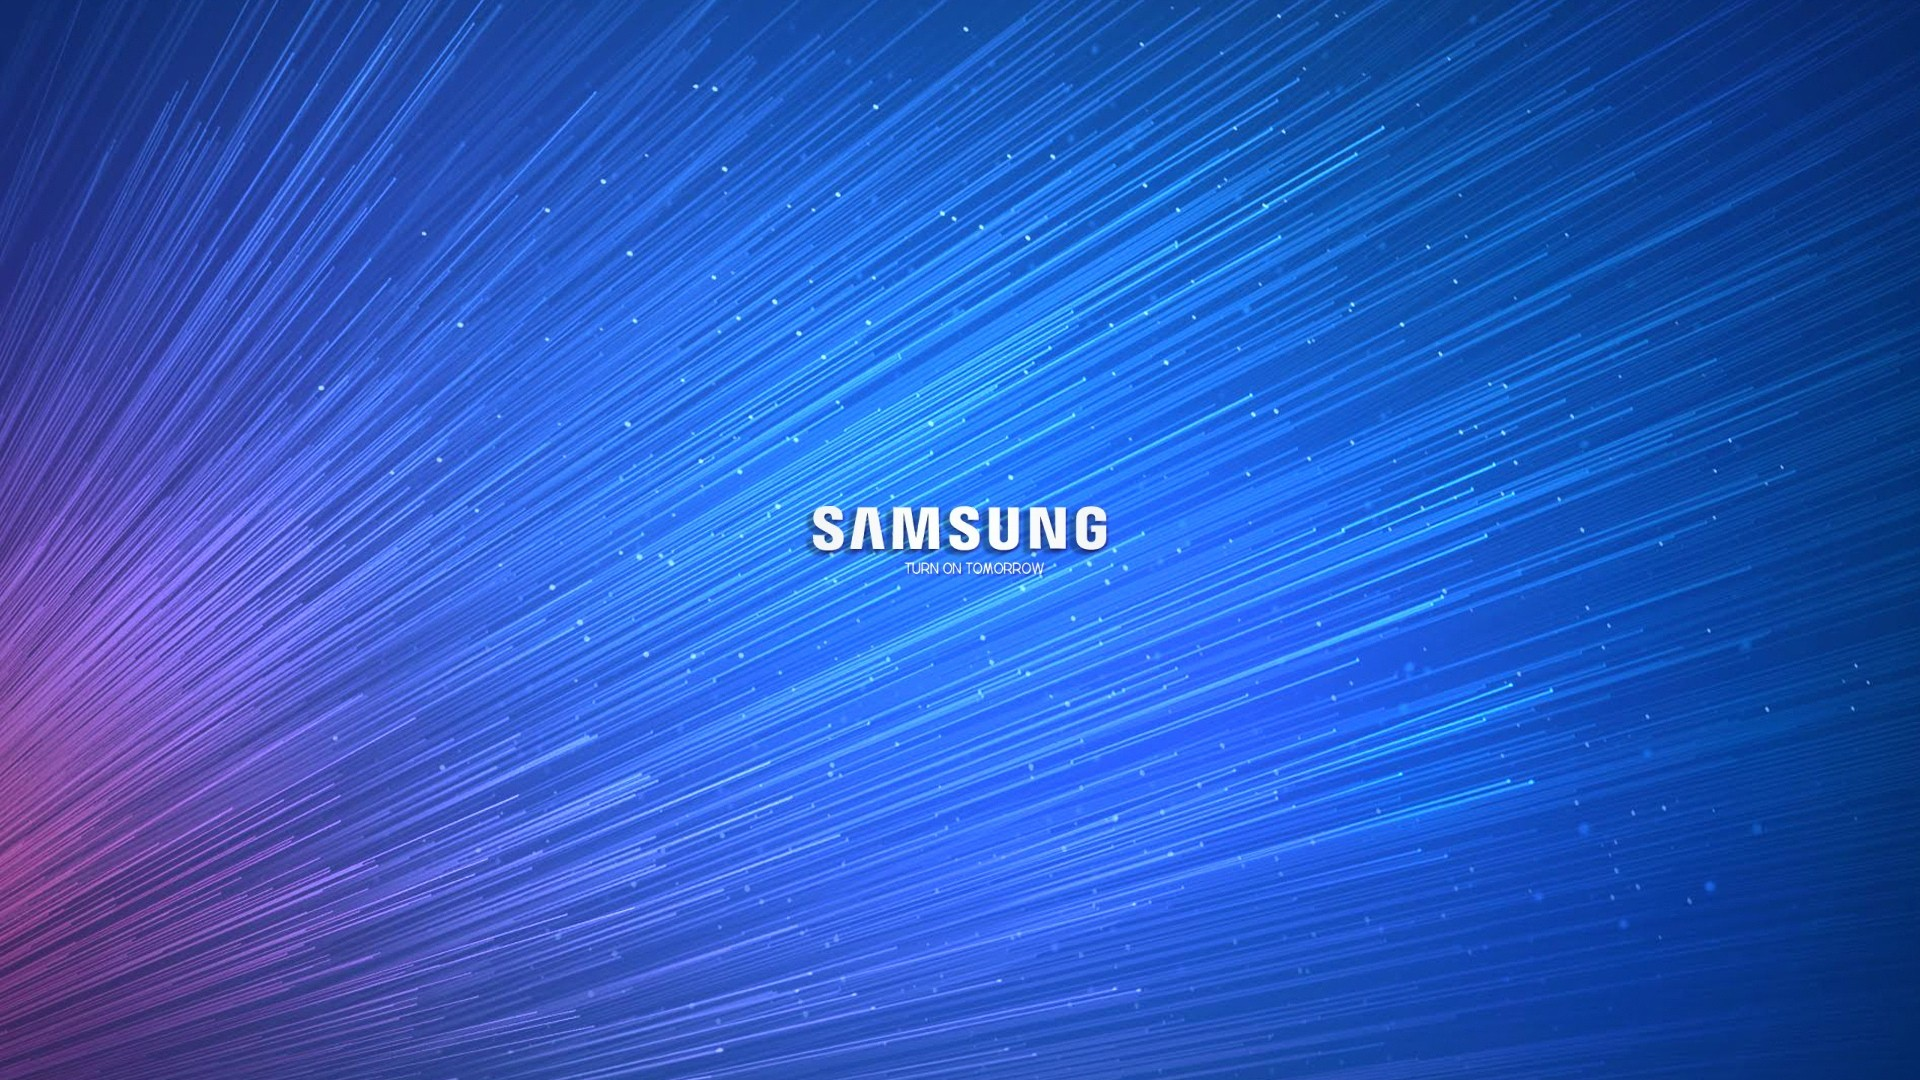 Samsung Download Wallpaper